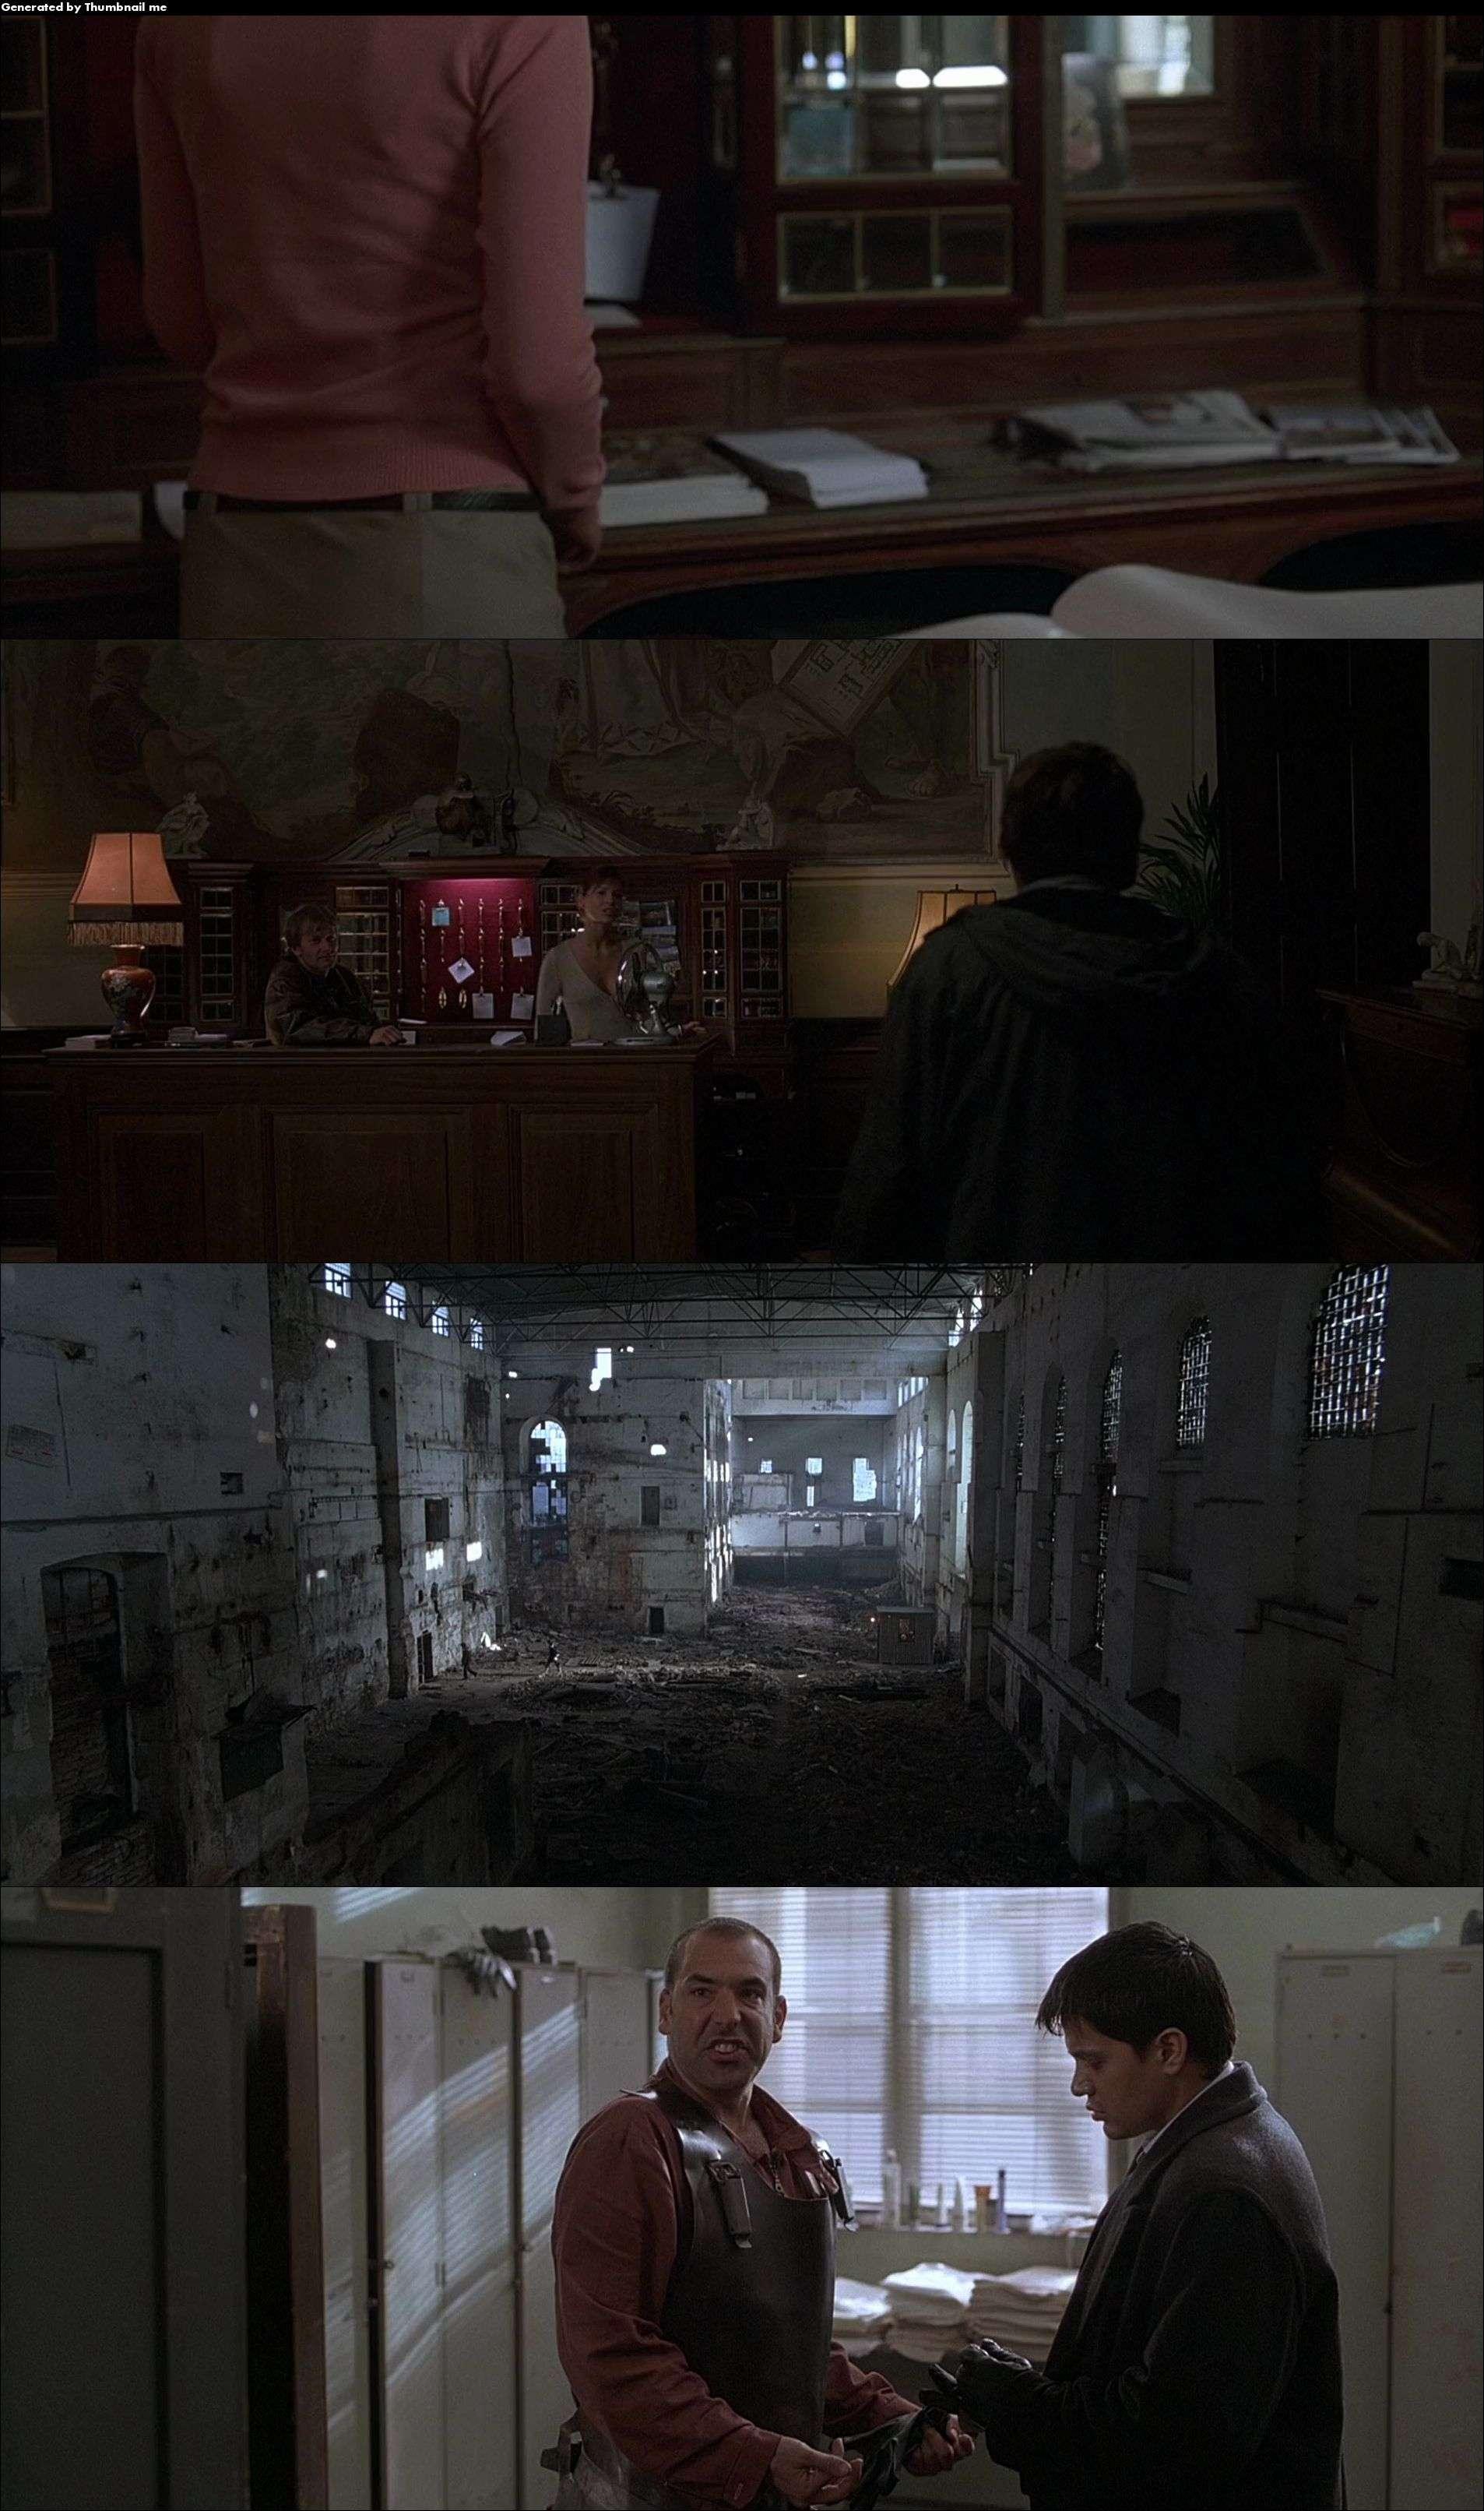 Otel - Hostel (2005) türkçe dublaj film indir